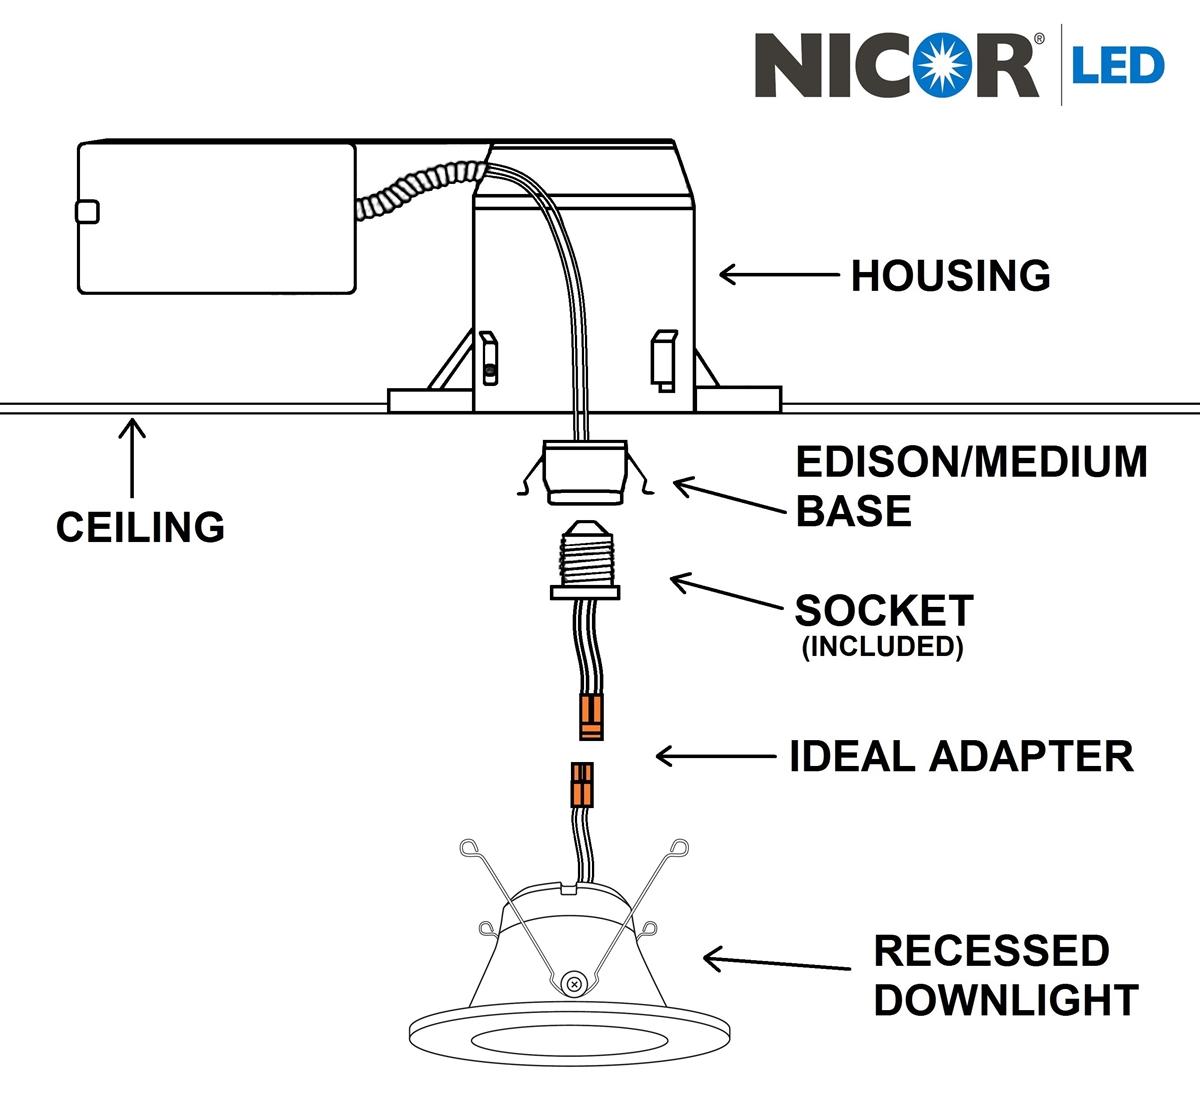 nicor dlr56 3008 recessed led downlight rh lightexpertsdirect com UL 924 Wiring-Diagram Emergency Lighting Wiring Diagram